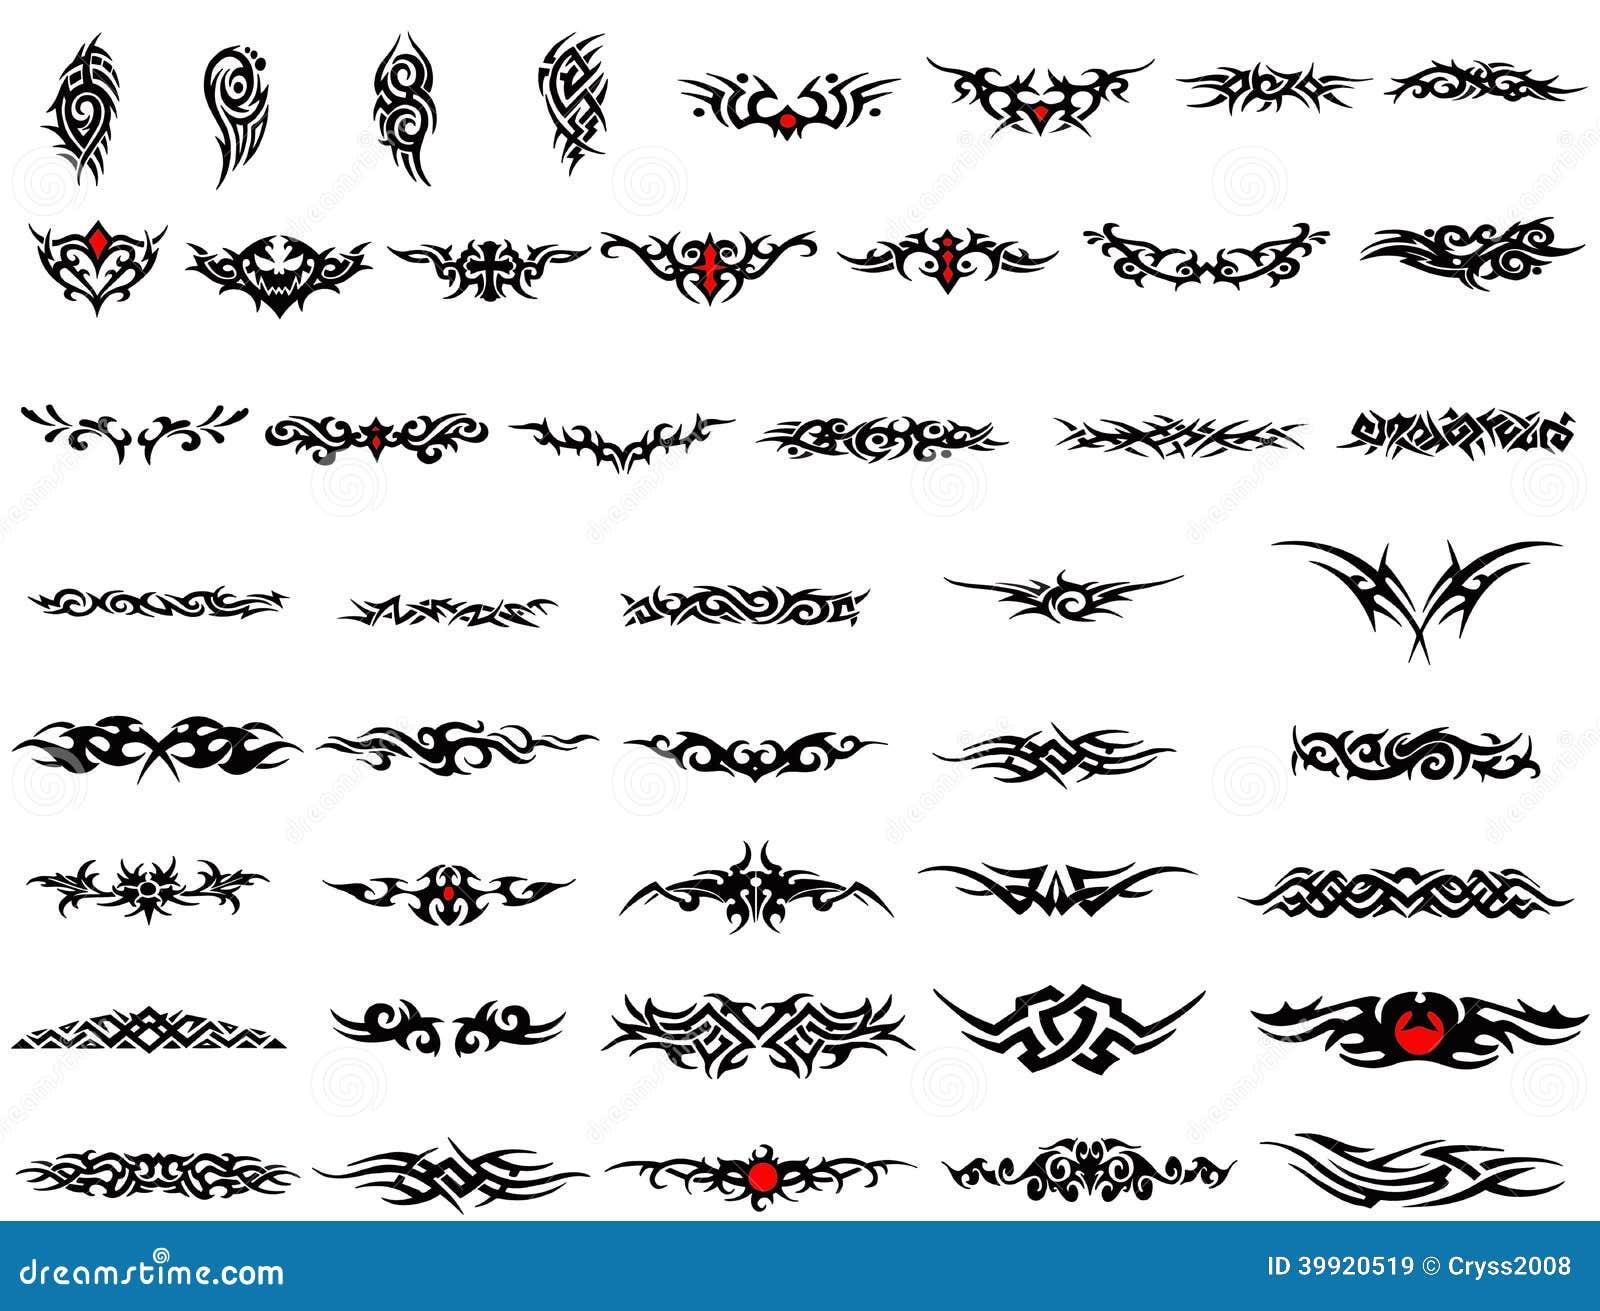 Arm Bands Tattoo Stock Illustration - Image: 39920519